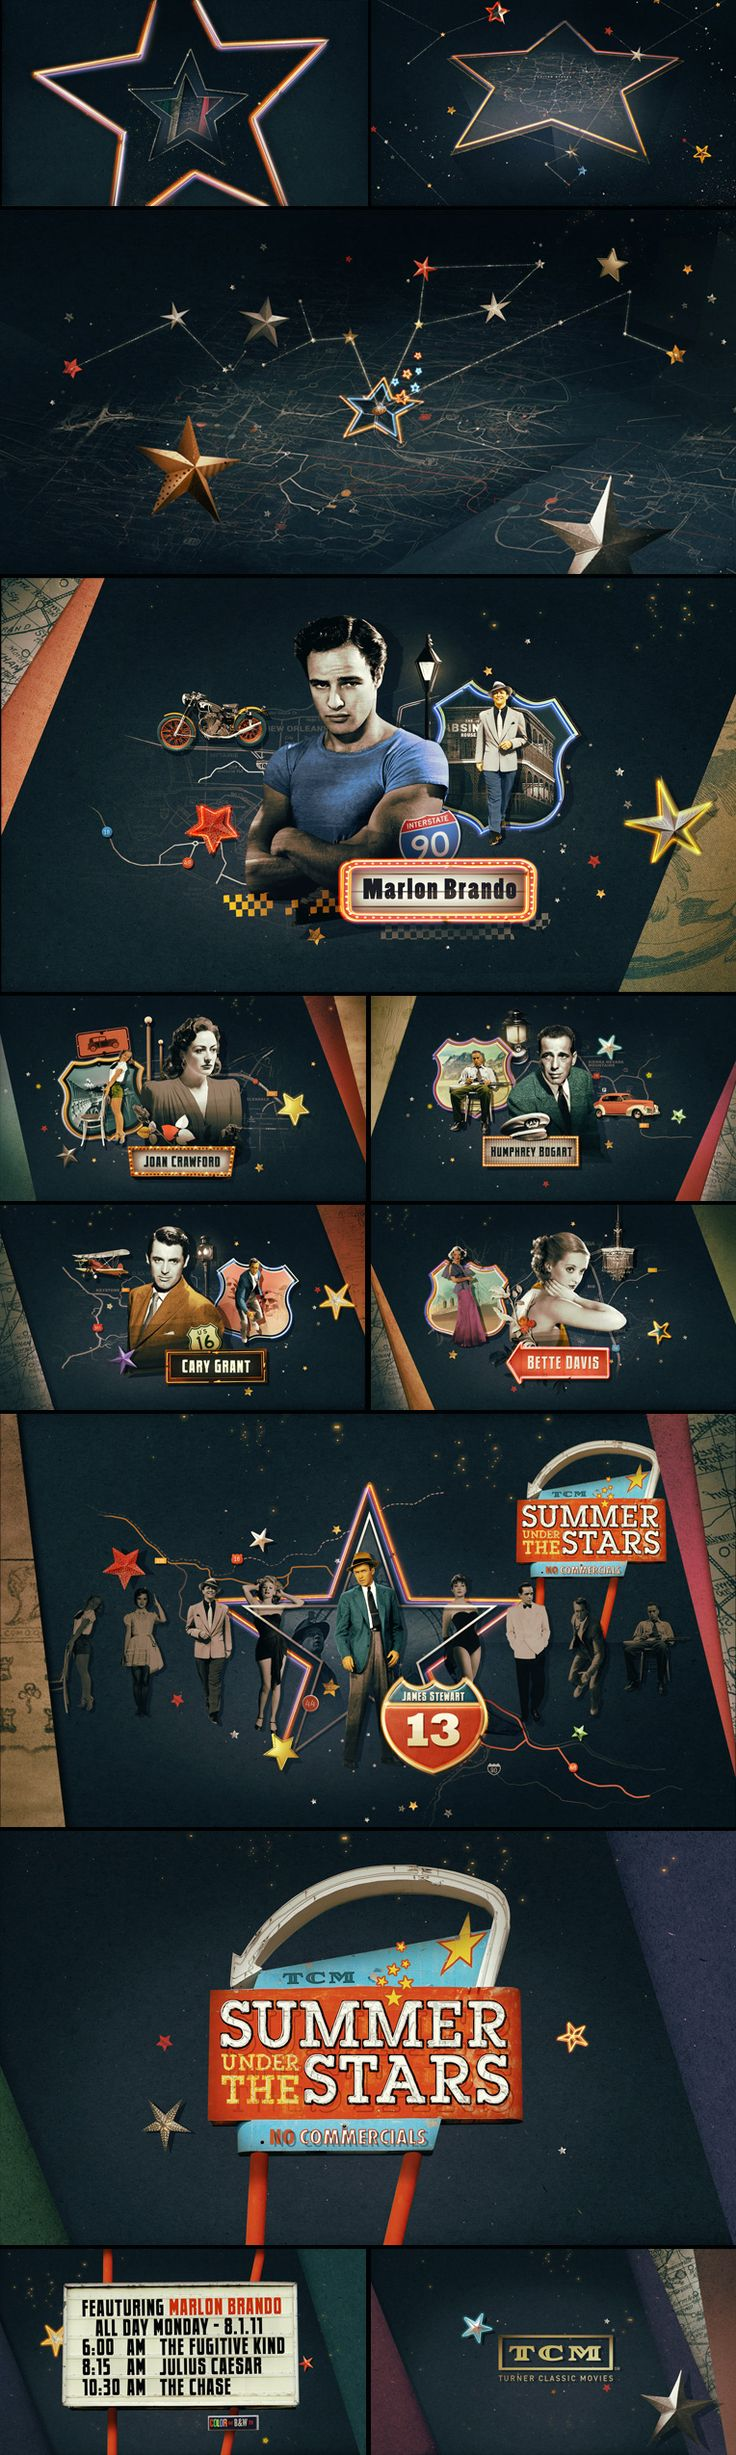 Loica.tv - Boards: TCM - Summer Under the Stars